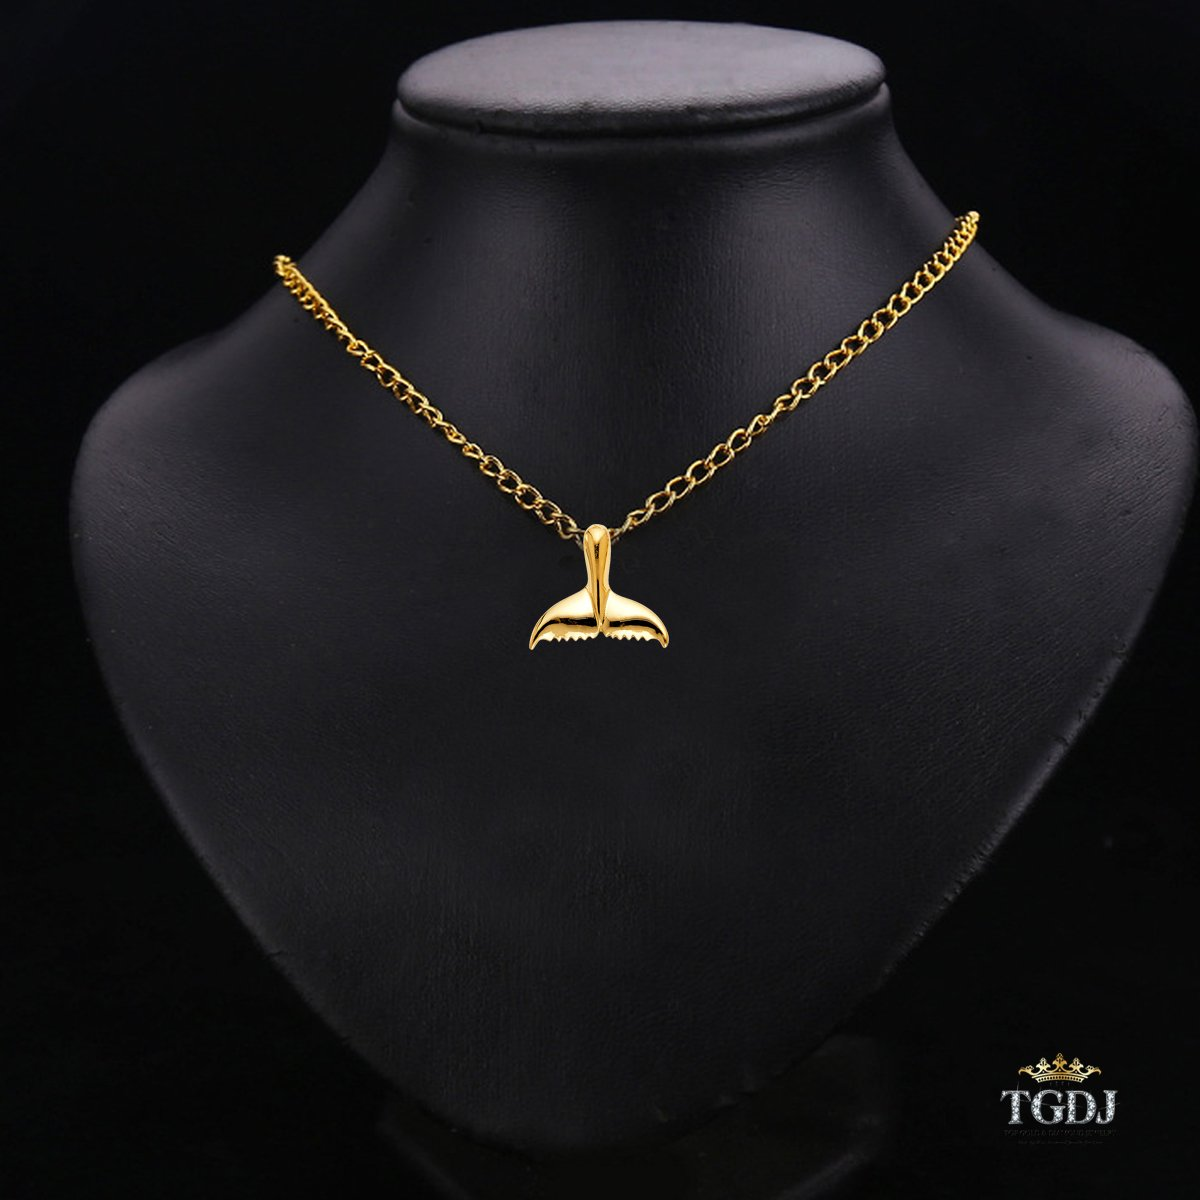 TGDJ 14K Yellow Gold Tail of Dolphin Pendant